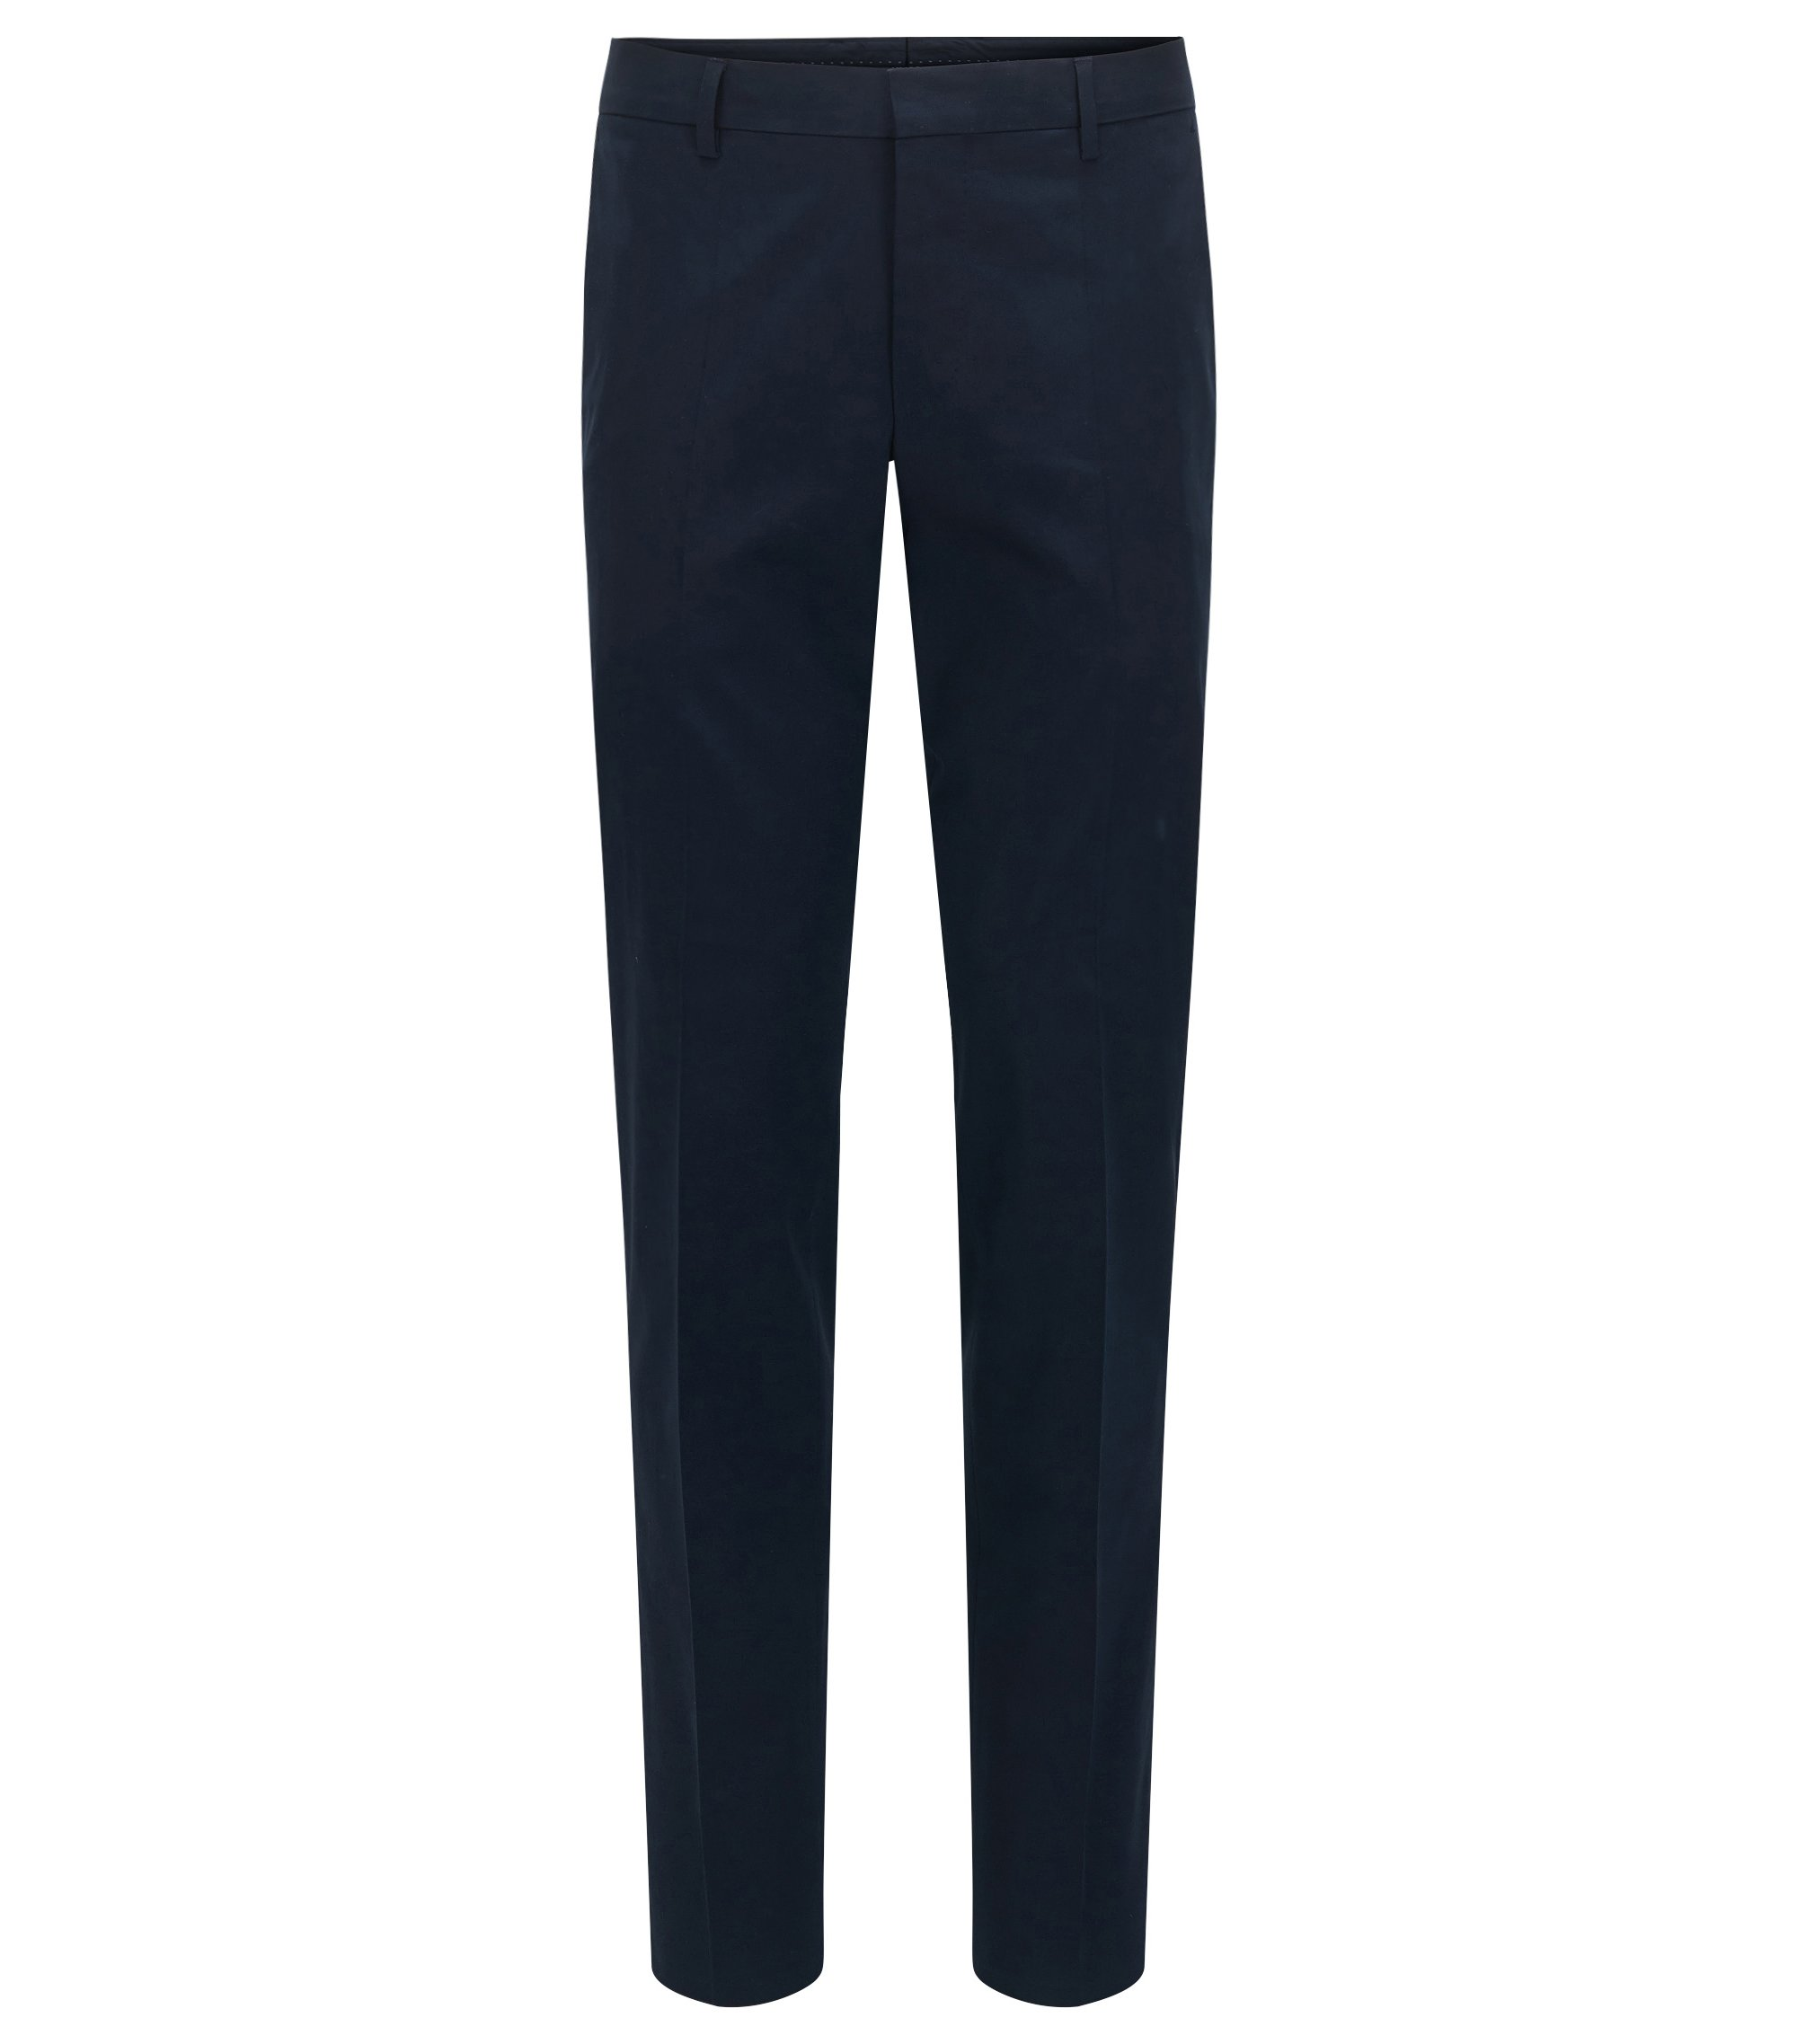 Pantalón slim fit en algodón elástico, Azul oscuro